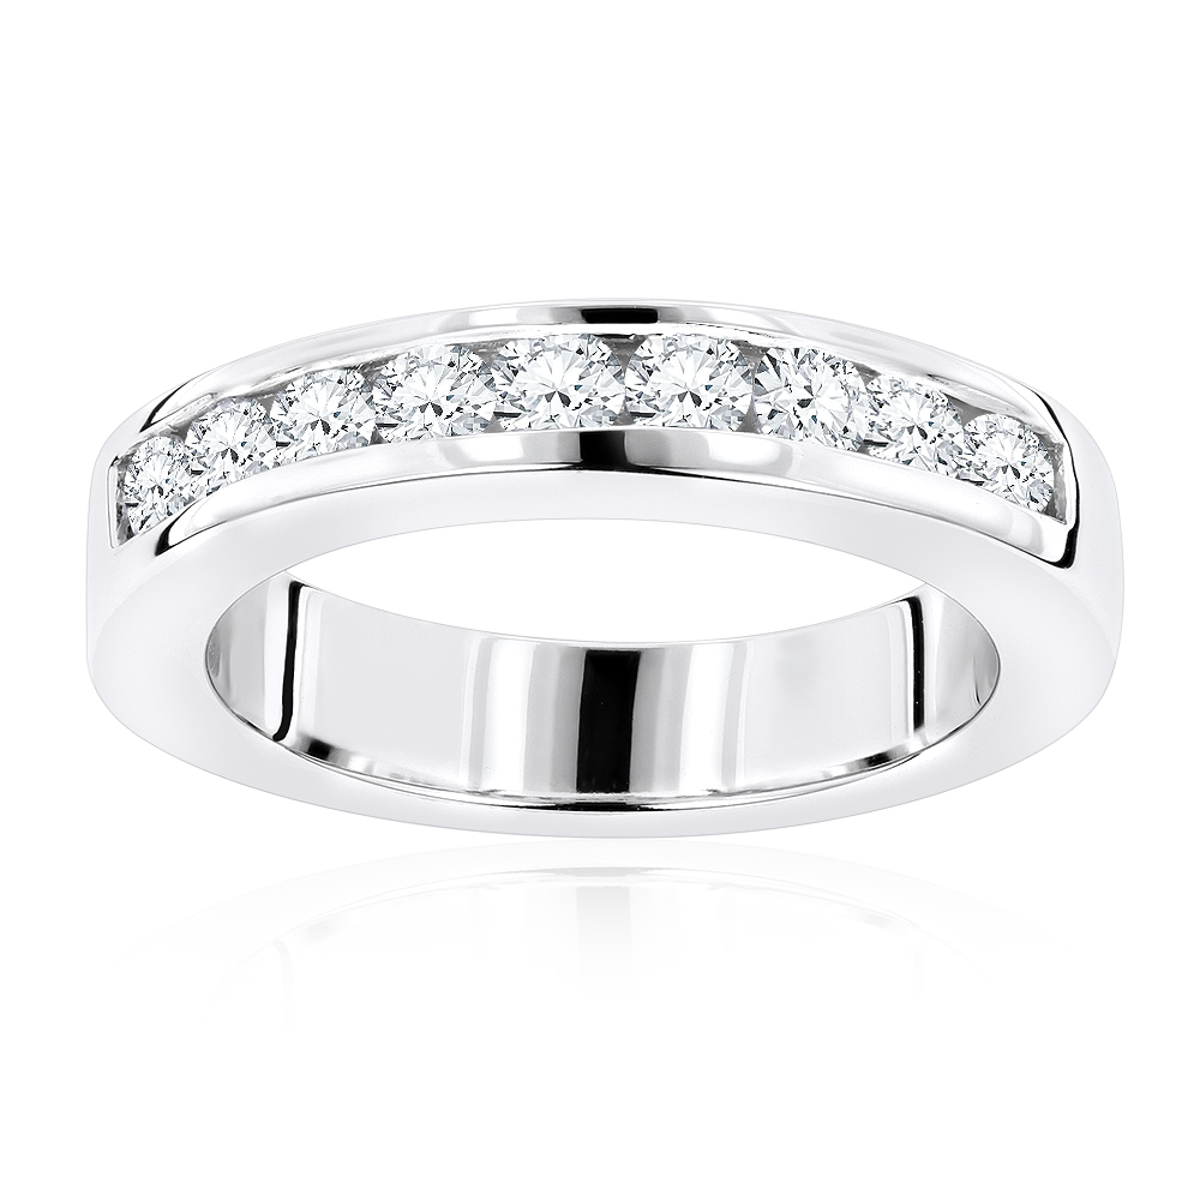 Thin 18K Gold Round Diamond Wedding Band for Her G/VS Diamonds 0.44ct